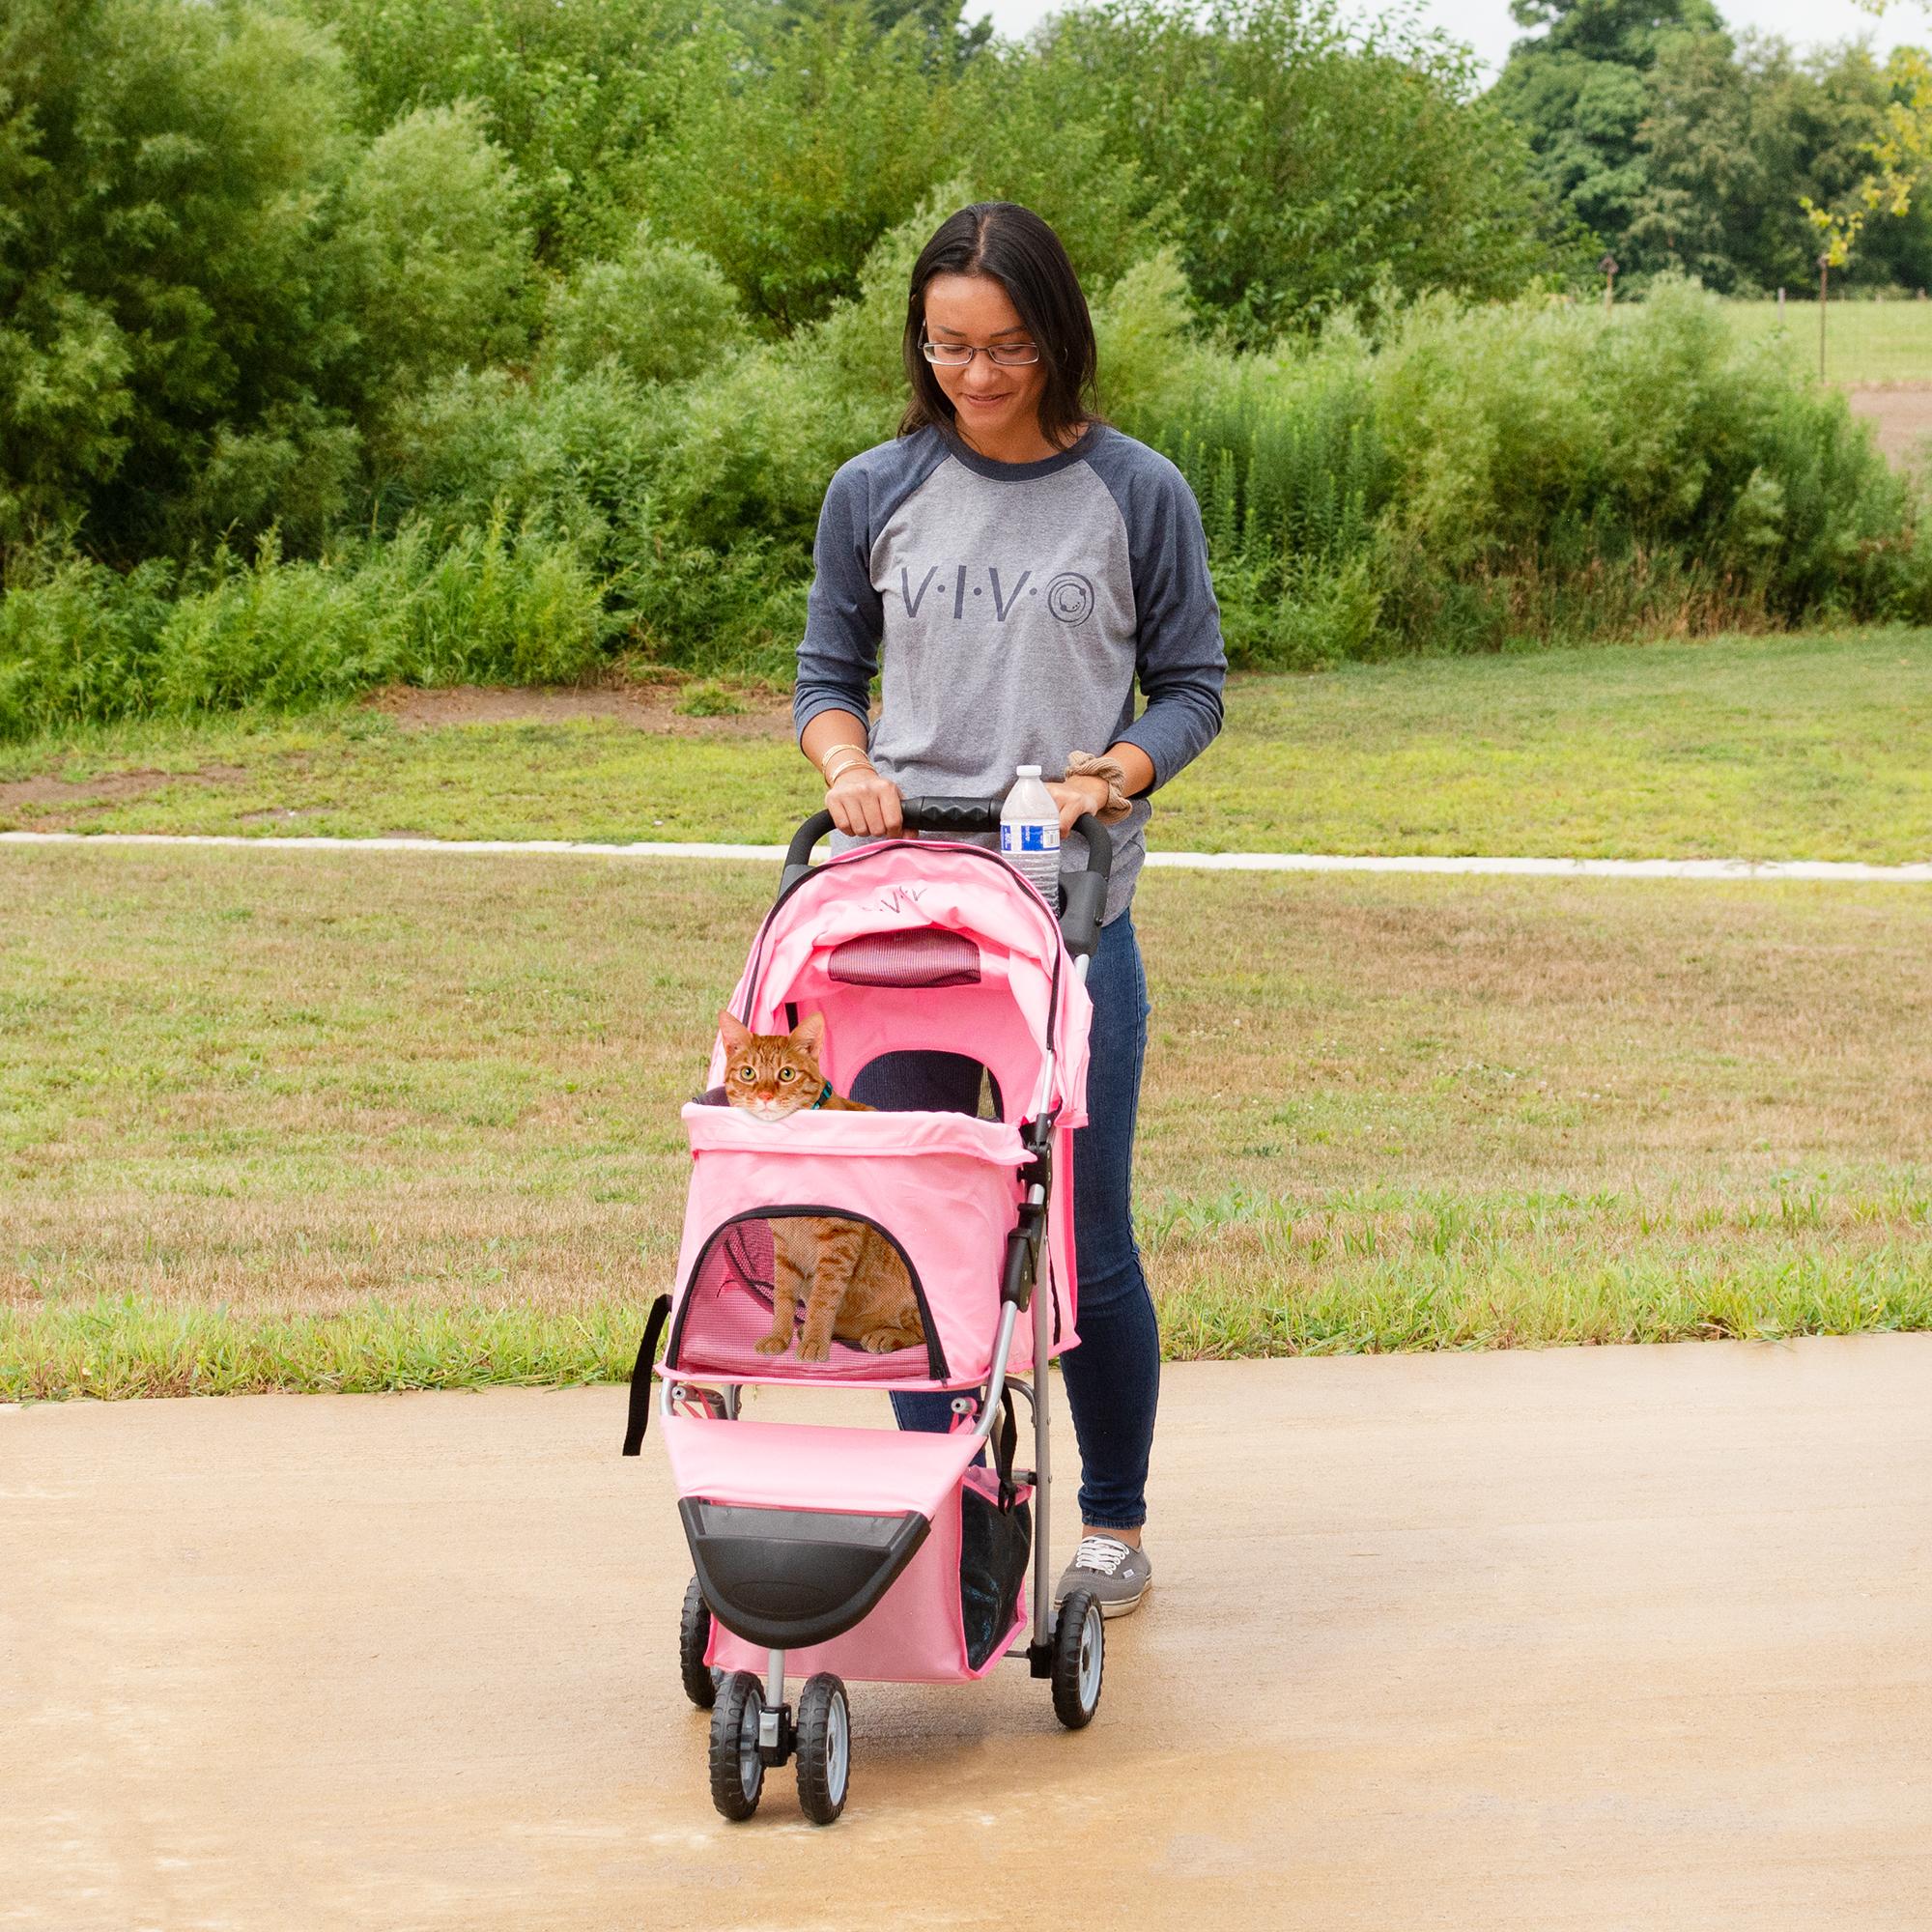 thumbnail 19 - VIVO Three Wheel Pet Stroller / Cat & Dog Foldable Carrier Strolling Cart